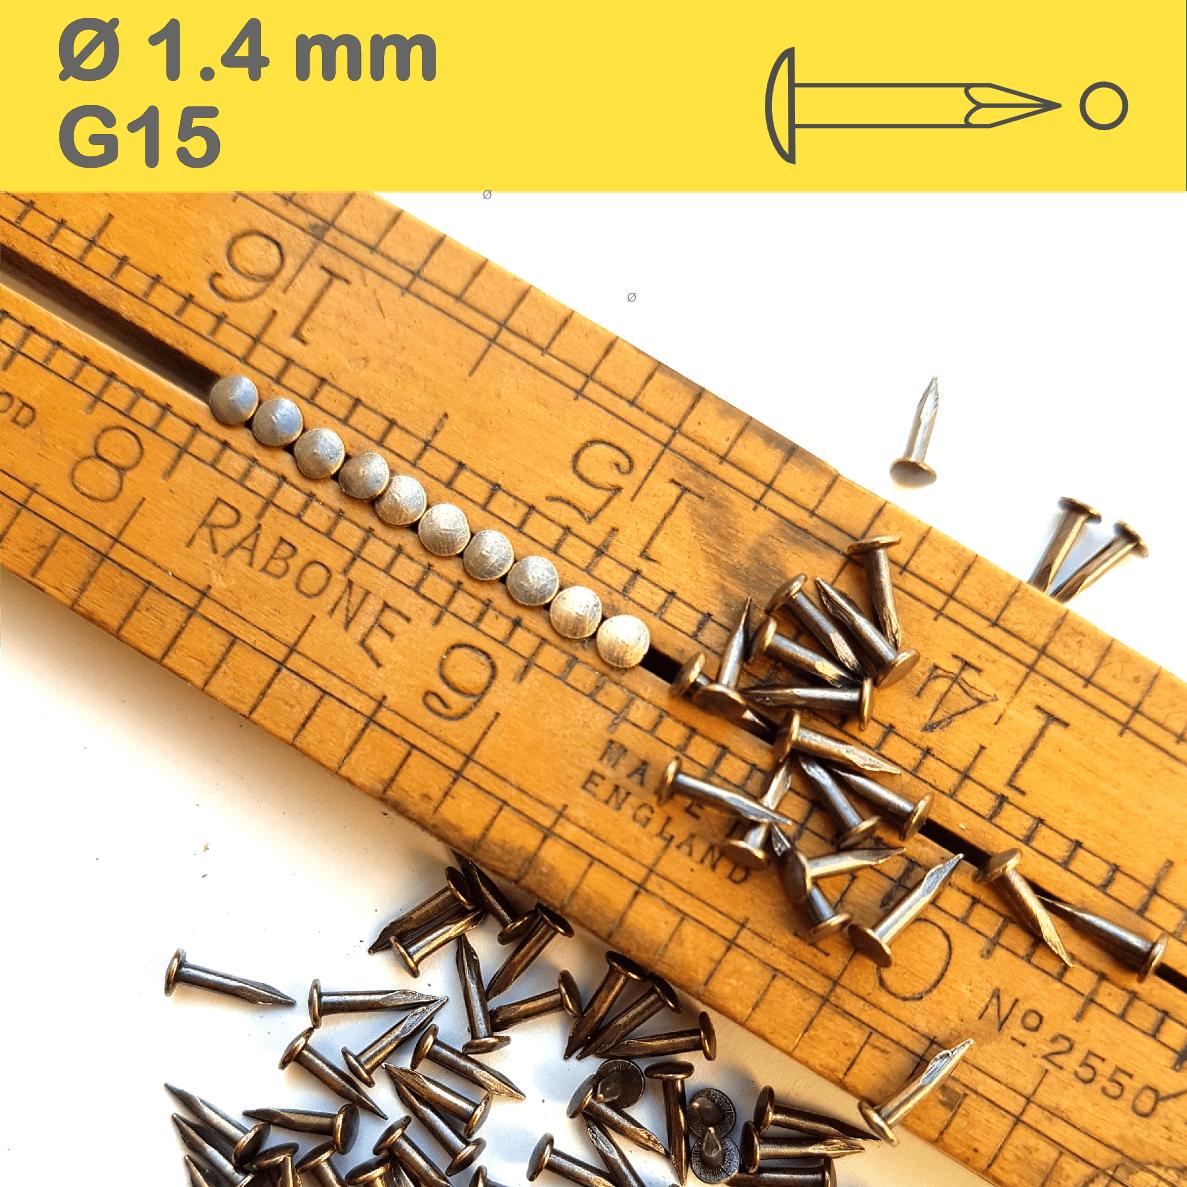 Brass Patina Antique Vintage NailsMessing Patiniert Antiquität Drahtstifte Dekonägel, Rundkopfstifte 1,4x8-13mm